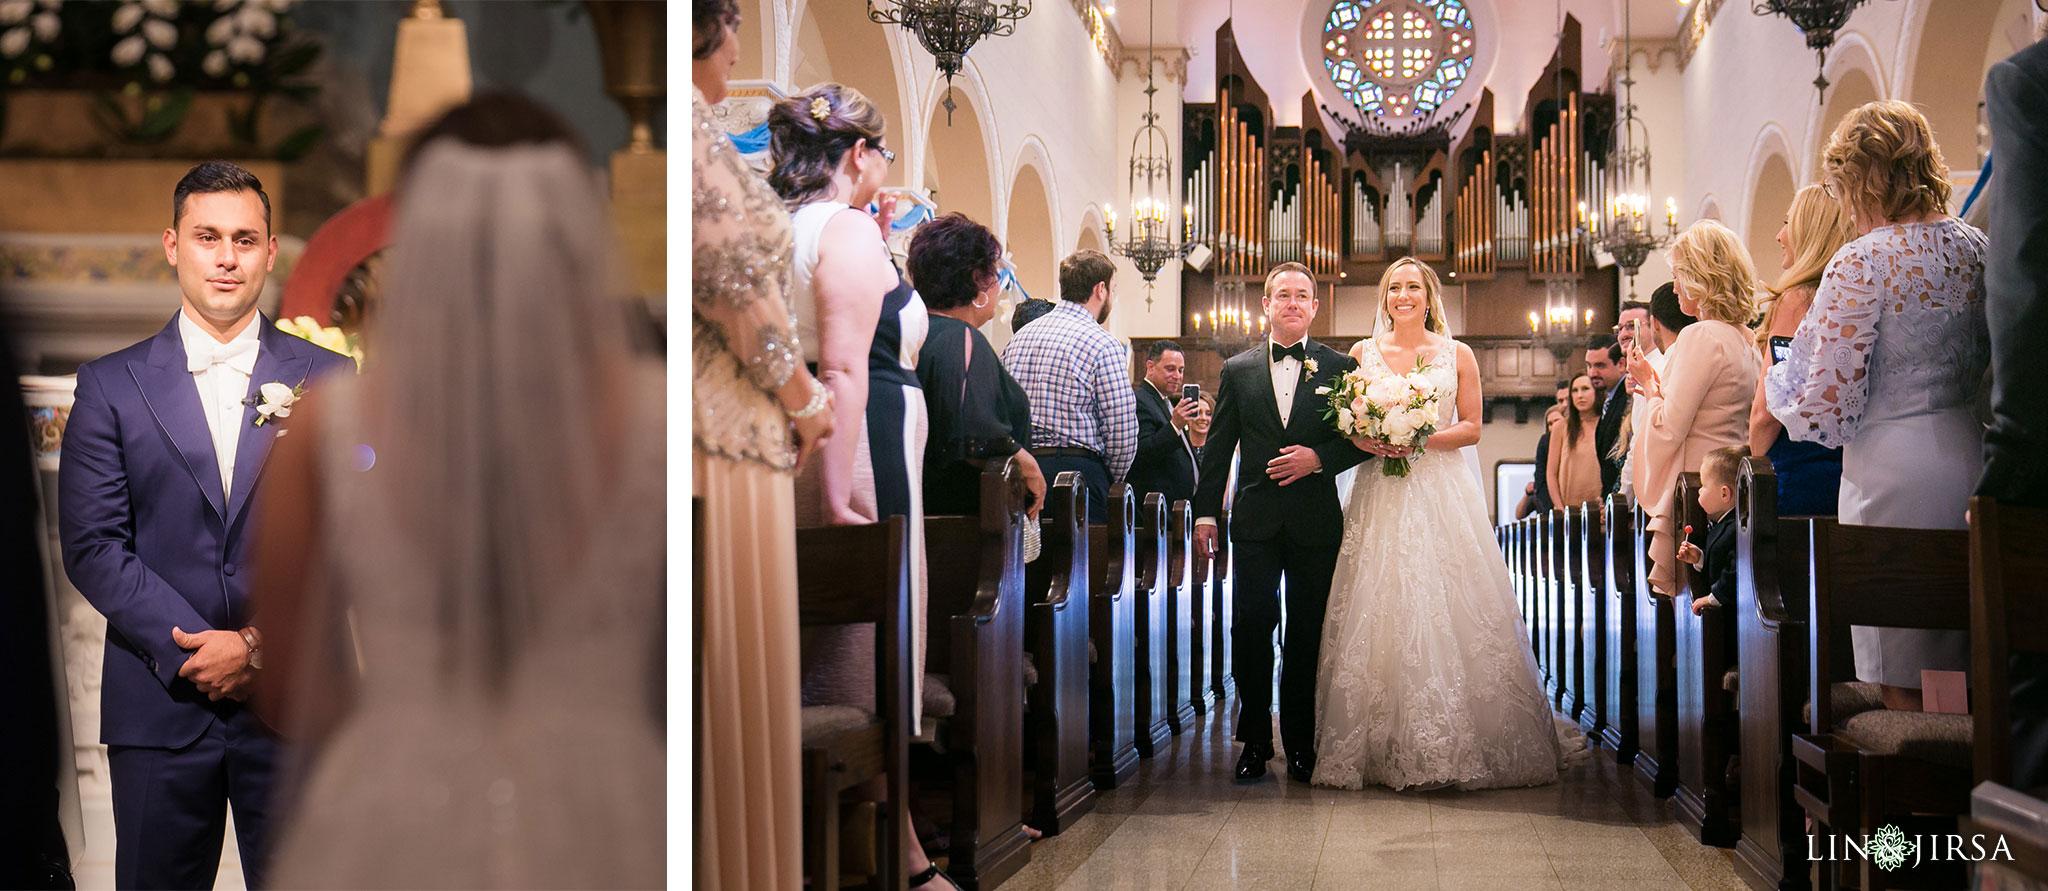 37 stmonica catholic church santa monica wedding ceremony photography